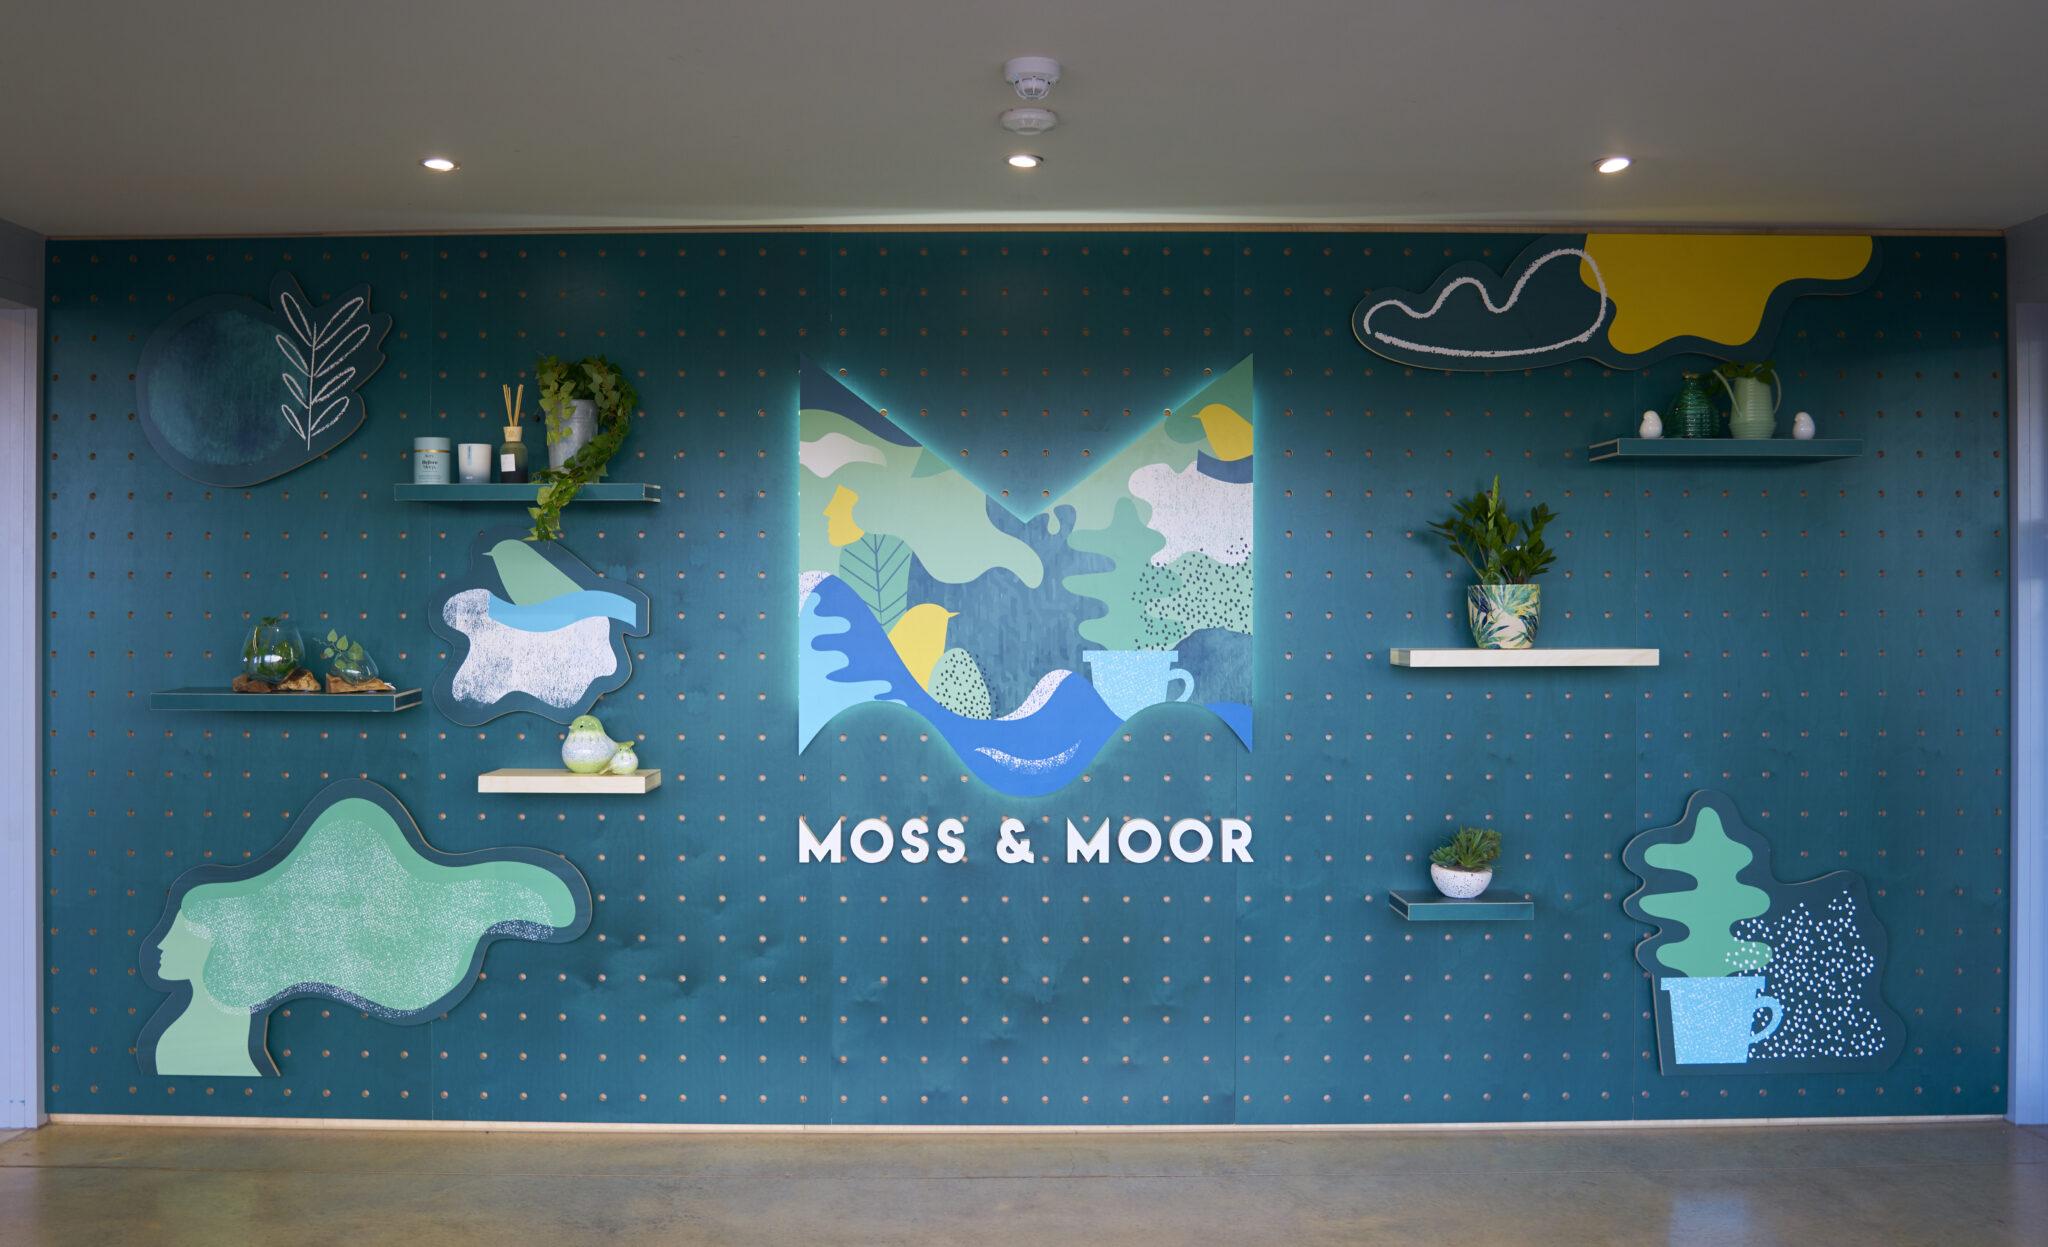 Welcome to Moss & Moor